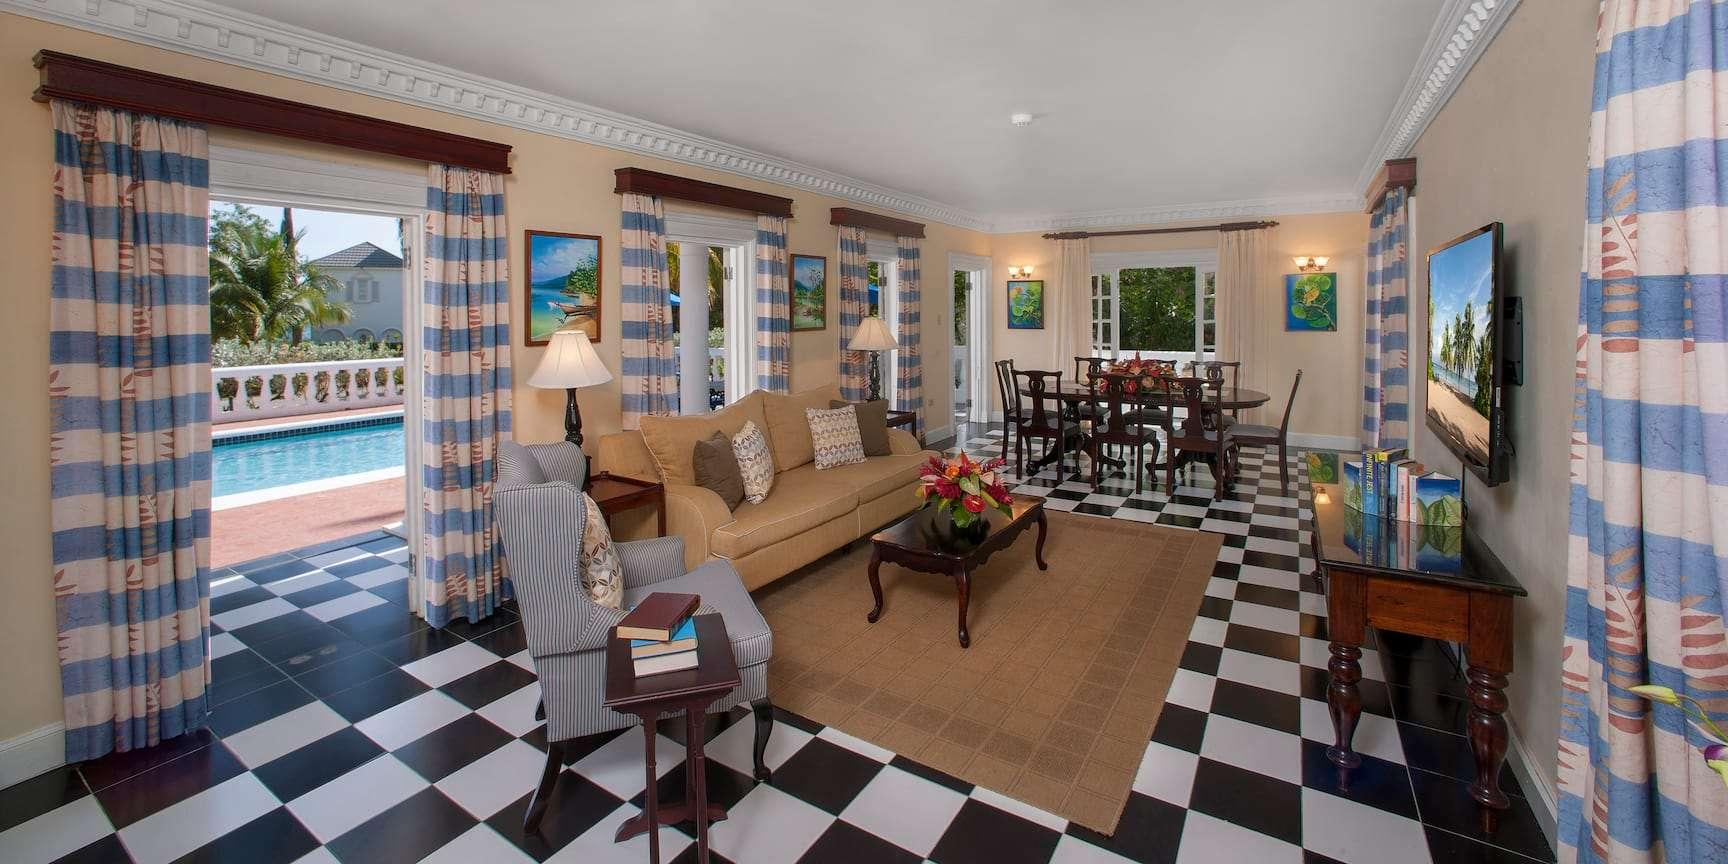 Luxury villa rentals caribbean - Jamaica - Montego bay - Half moon resort - 6 BDM Garden Villa - Image 1/14